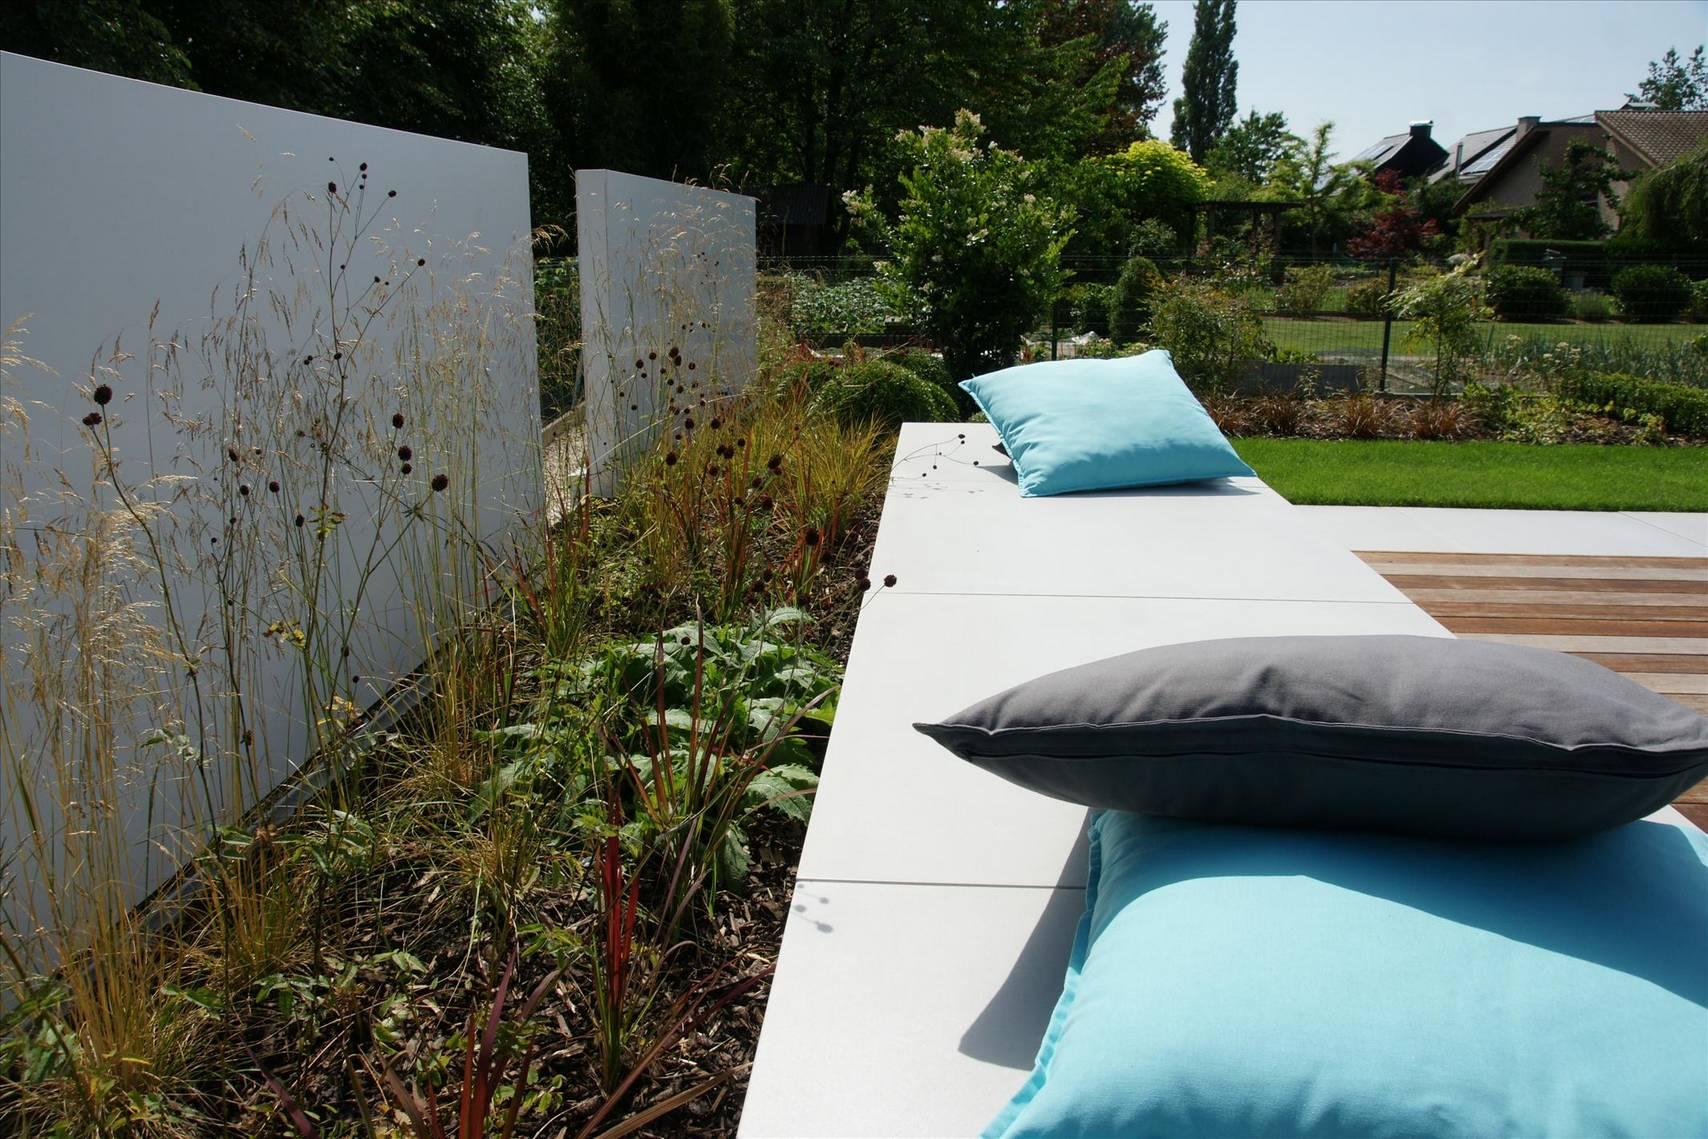 Eco tuinarchitectengroep projecten moderne lounge tuin - Moderne zwart witte lounge ...